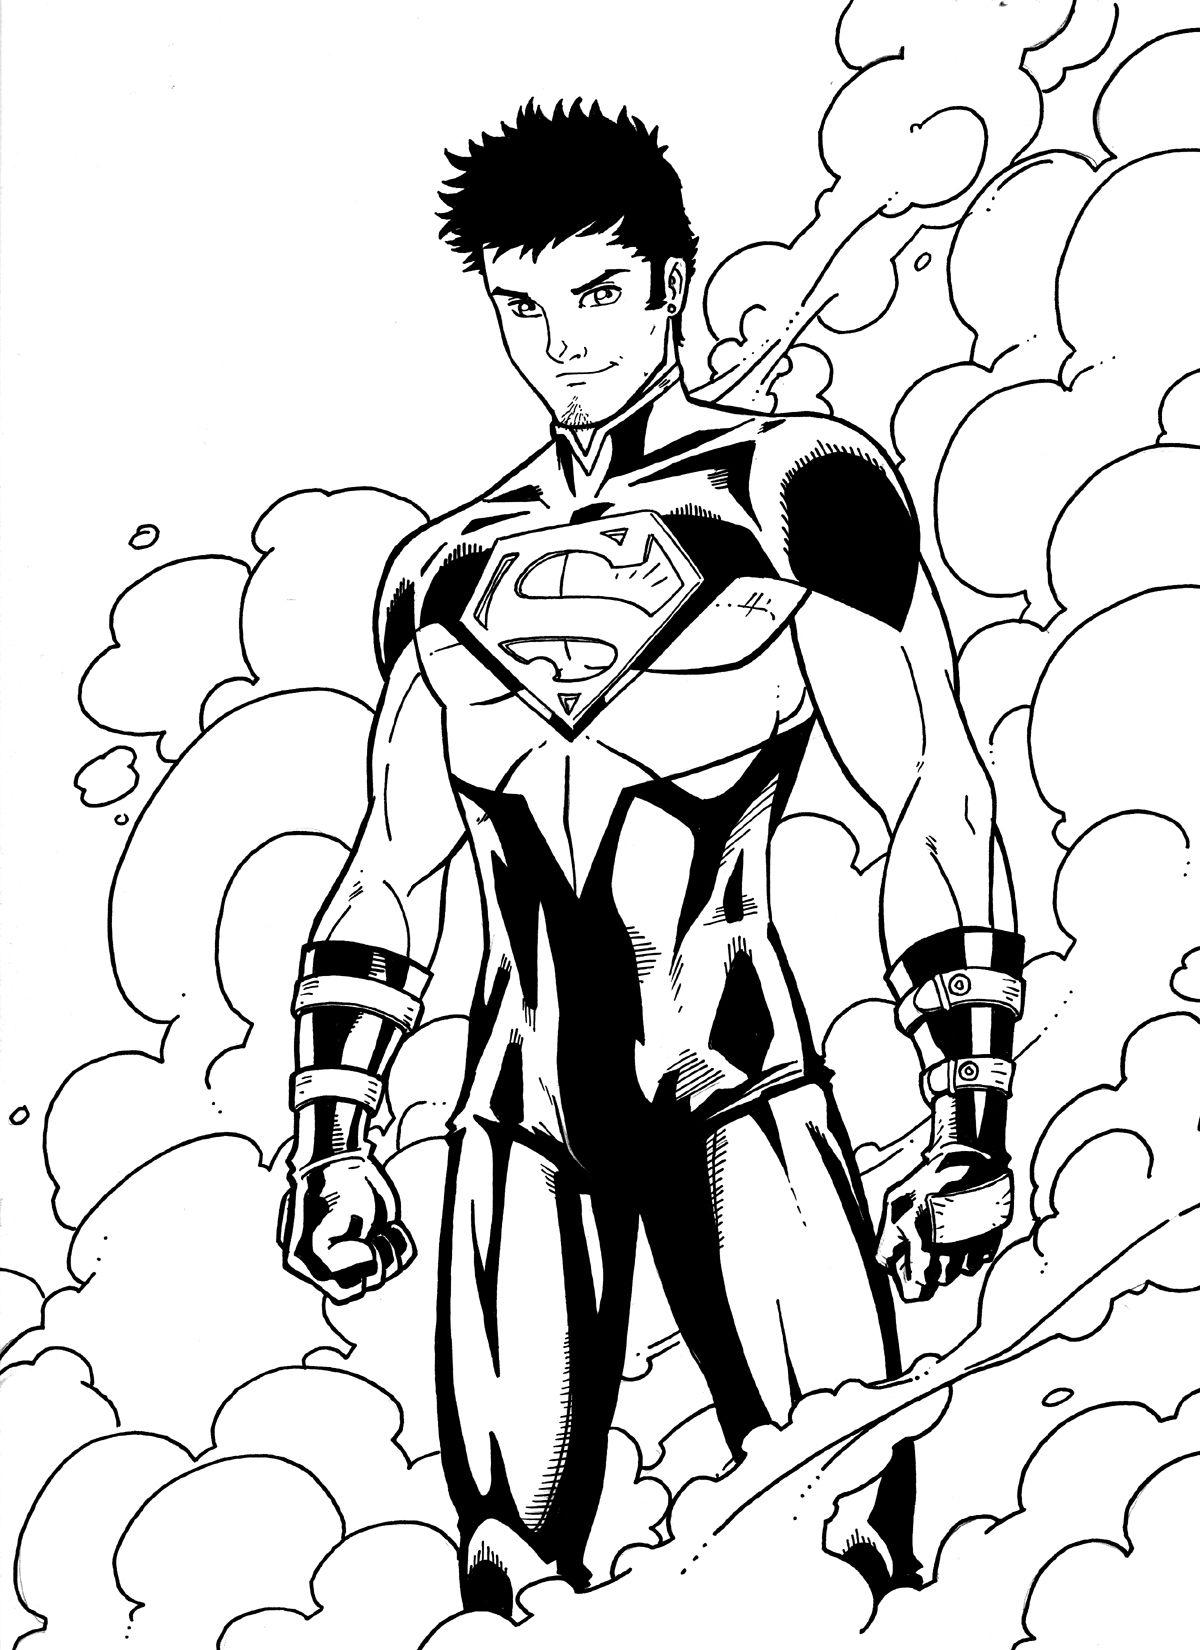 superboy returns by jamiefayx on deviantart coloring 4 kids dc